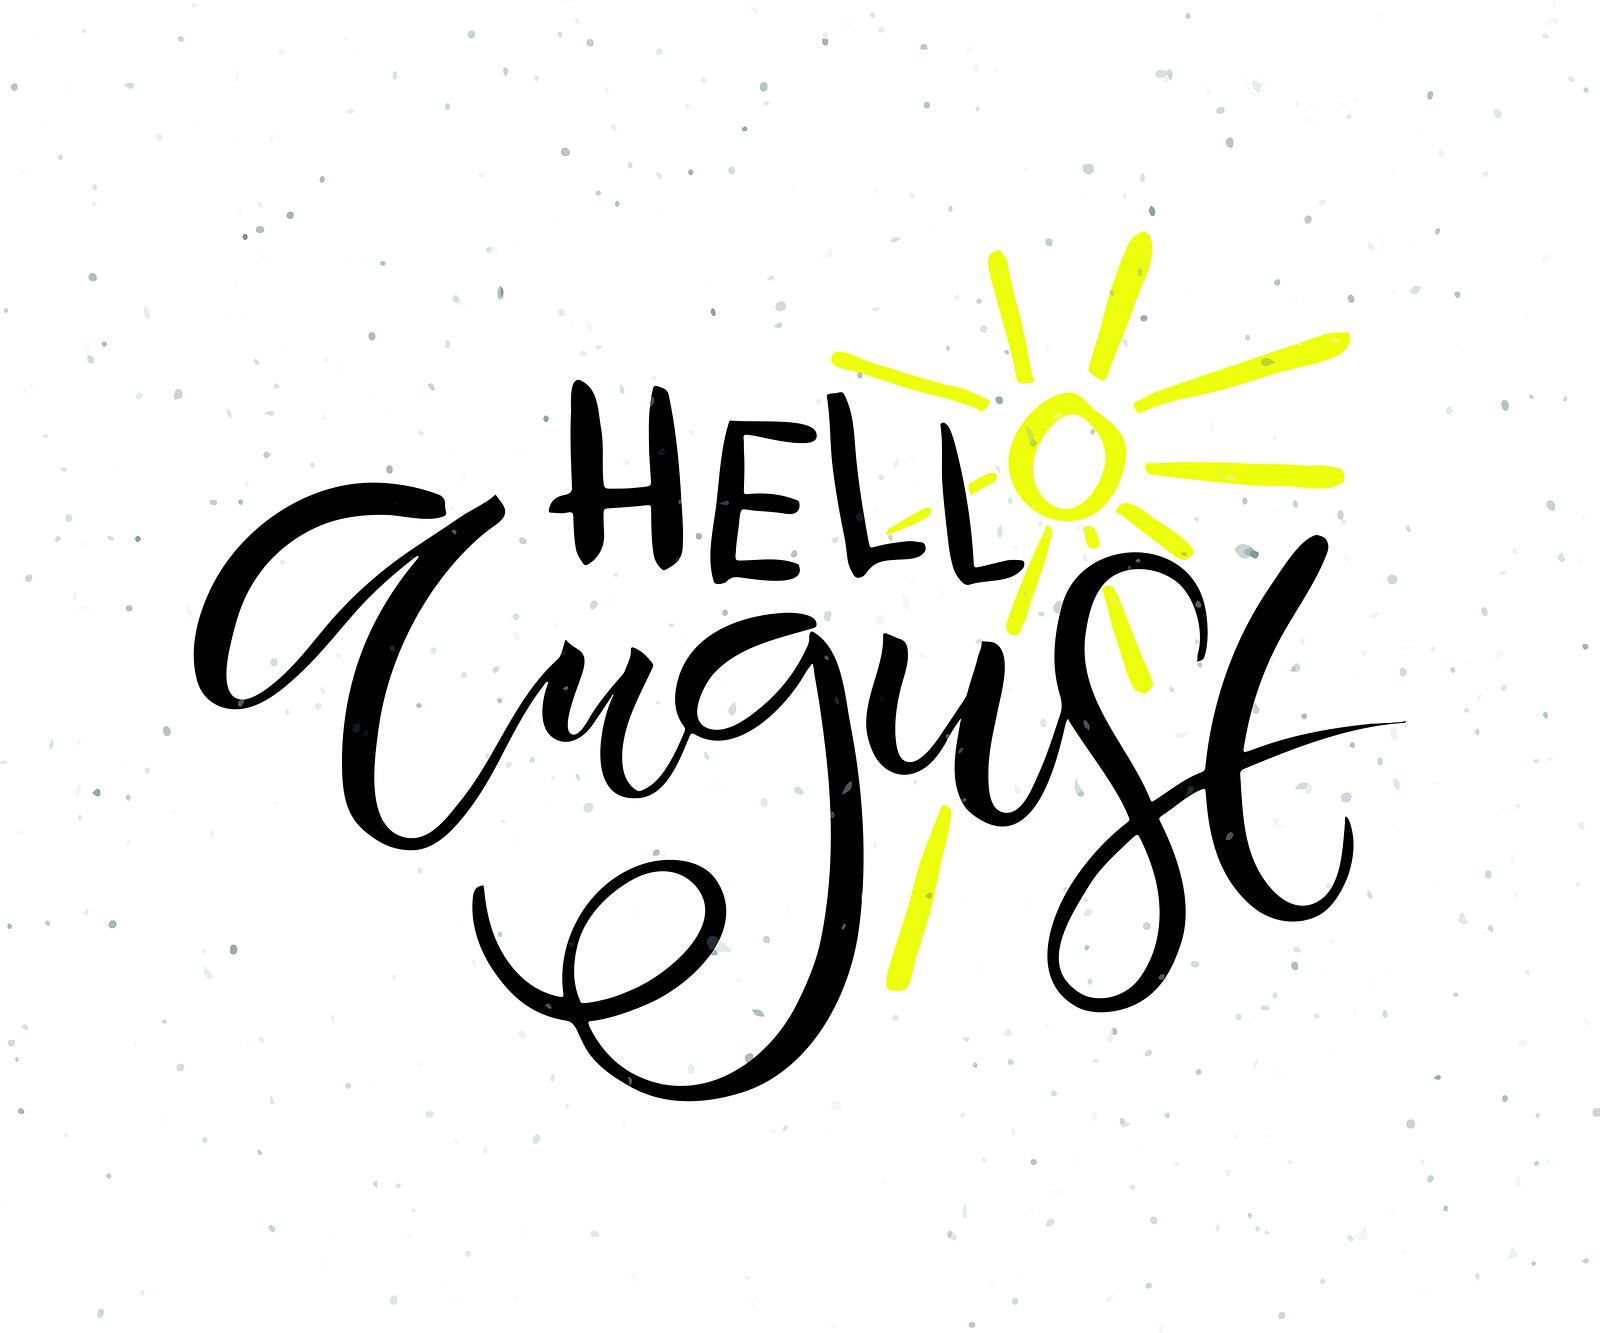 bigstock-Hello-August-Postcard-Card-I-141752006.jpg